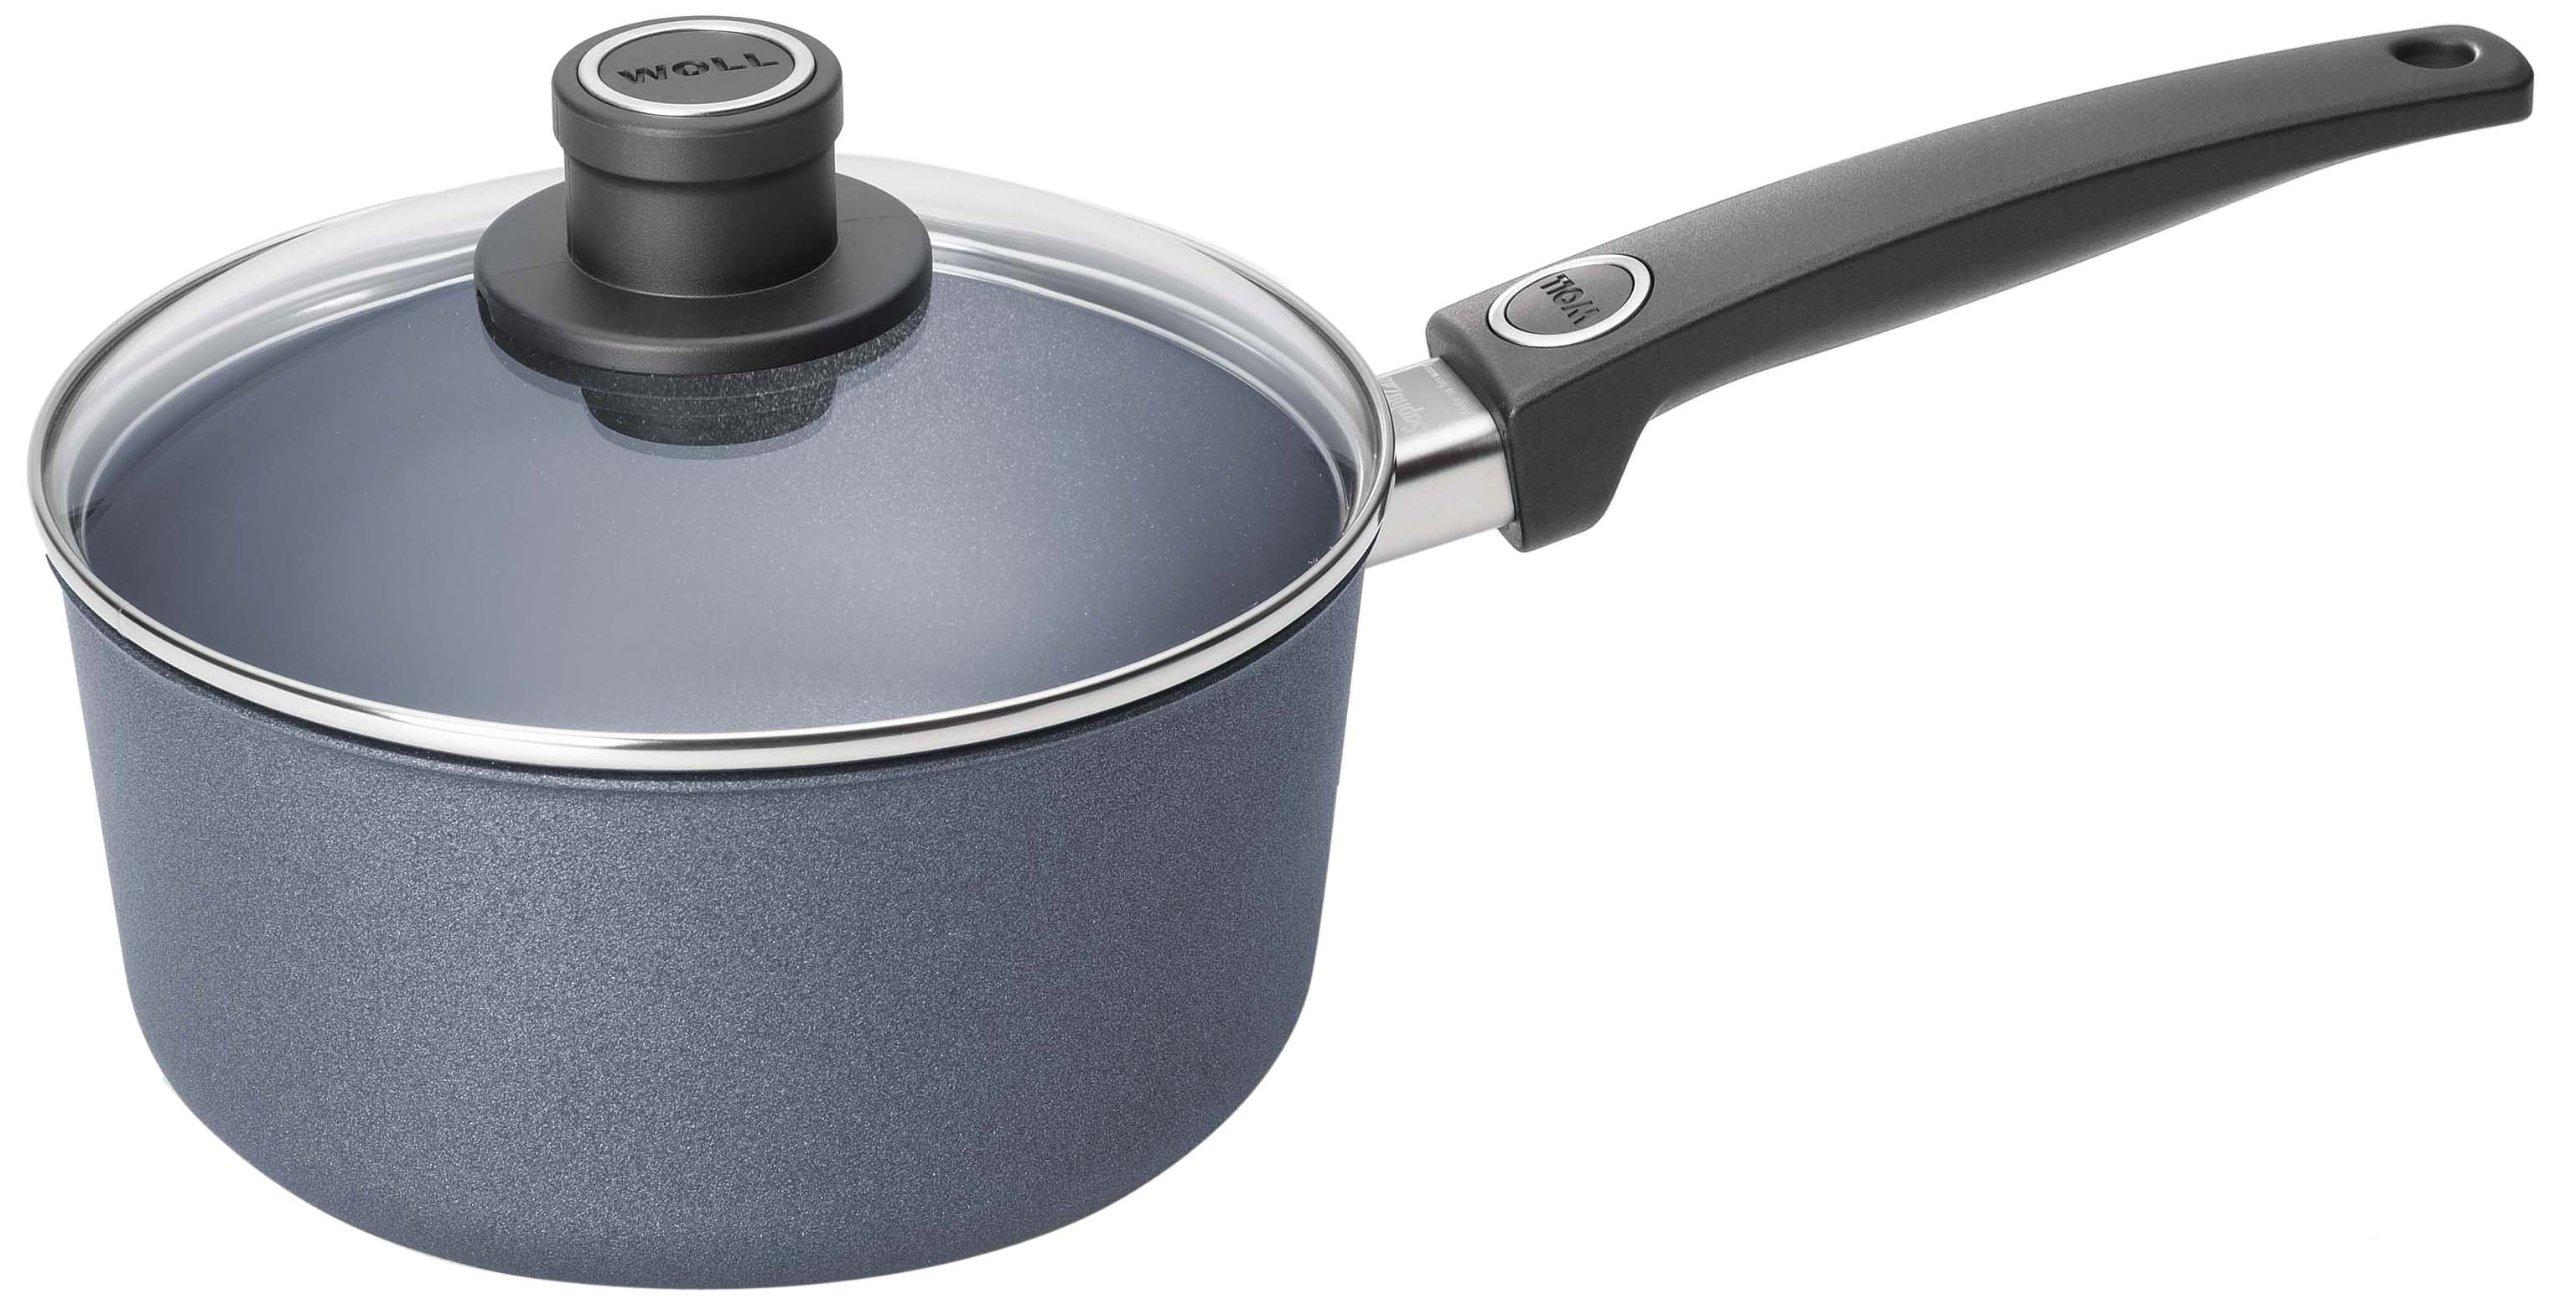 Woll Plus/Diamond Lite Sauce Pan, 3-Quart Saucepan with Lid